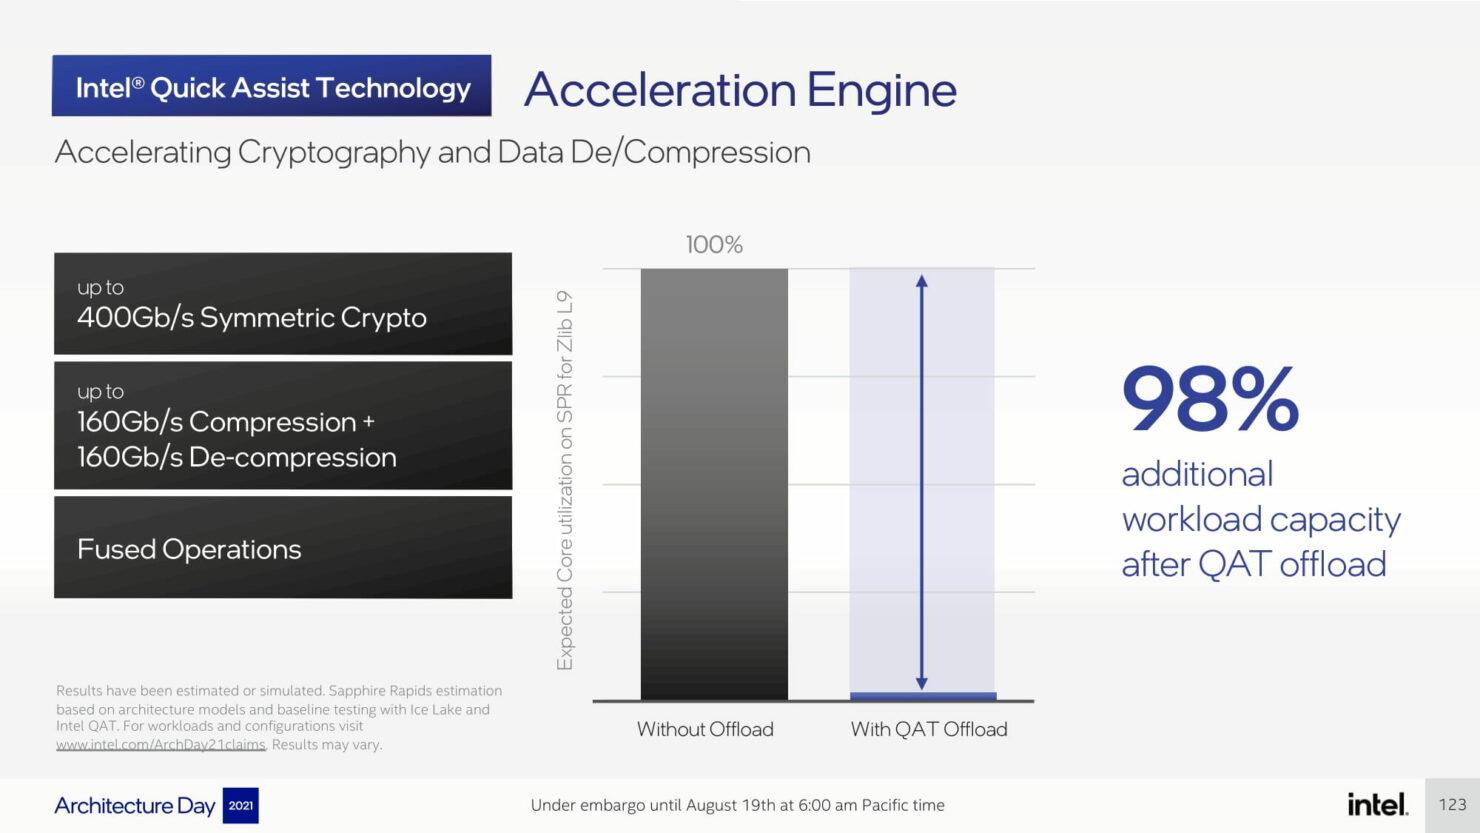 intel-architecture-day-2021_pressdeck_final_embargo-compressed-123